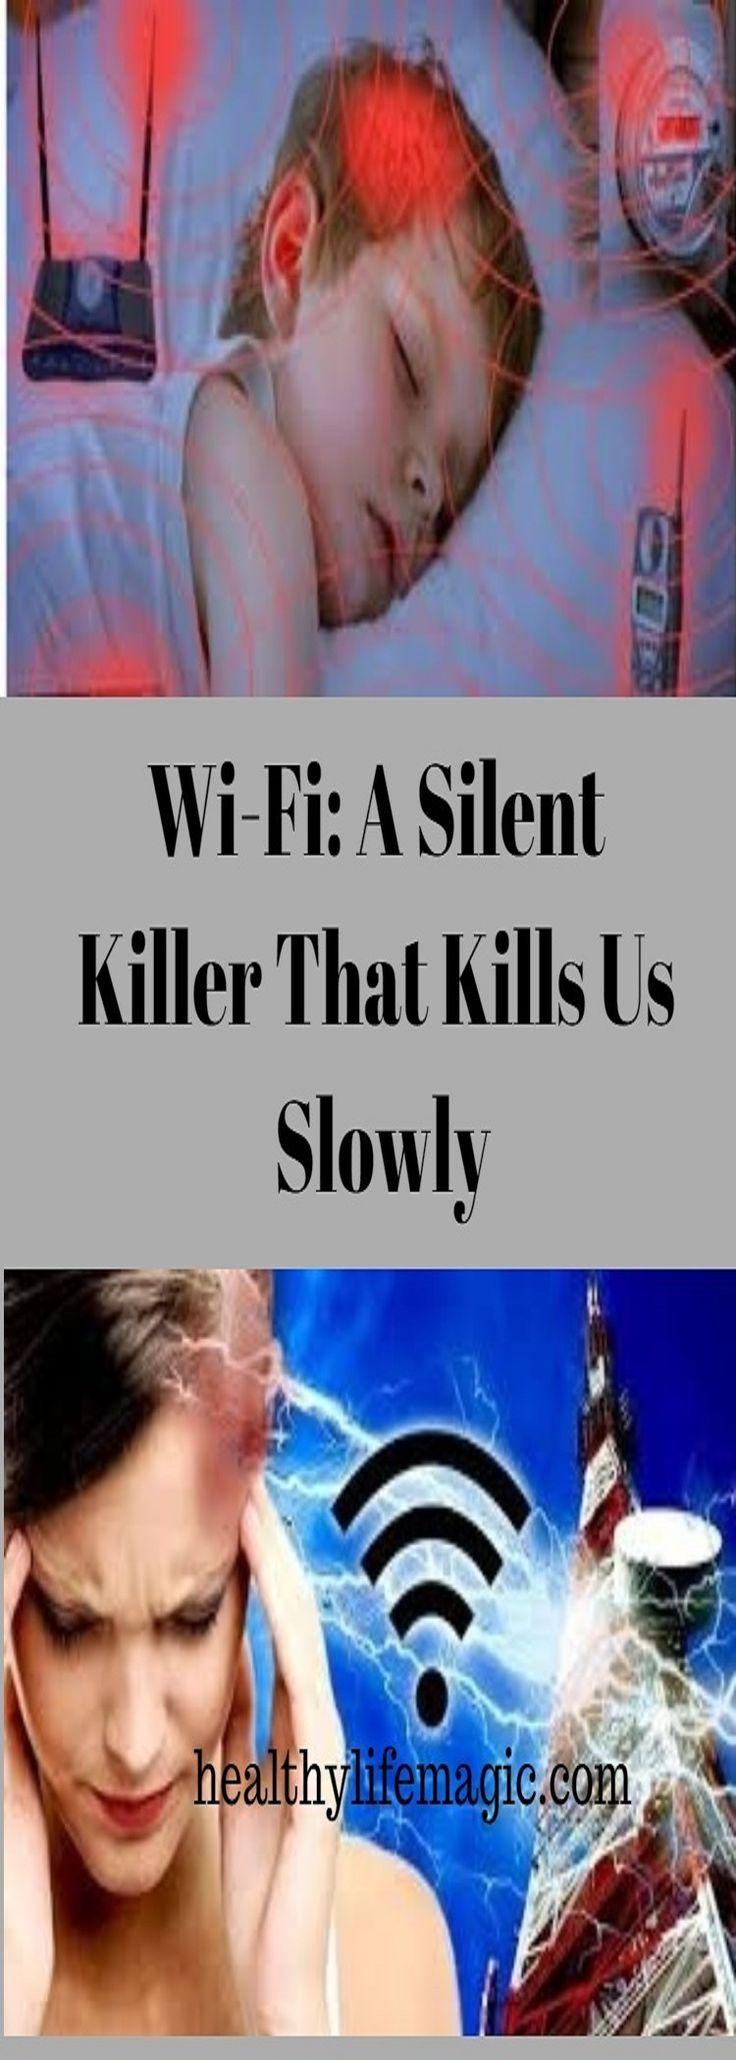 Wi-Fi: A Silent Killer That Kills Us Slowly | Healthy Life Magic